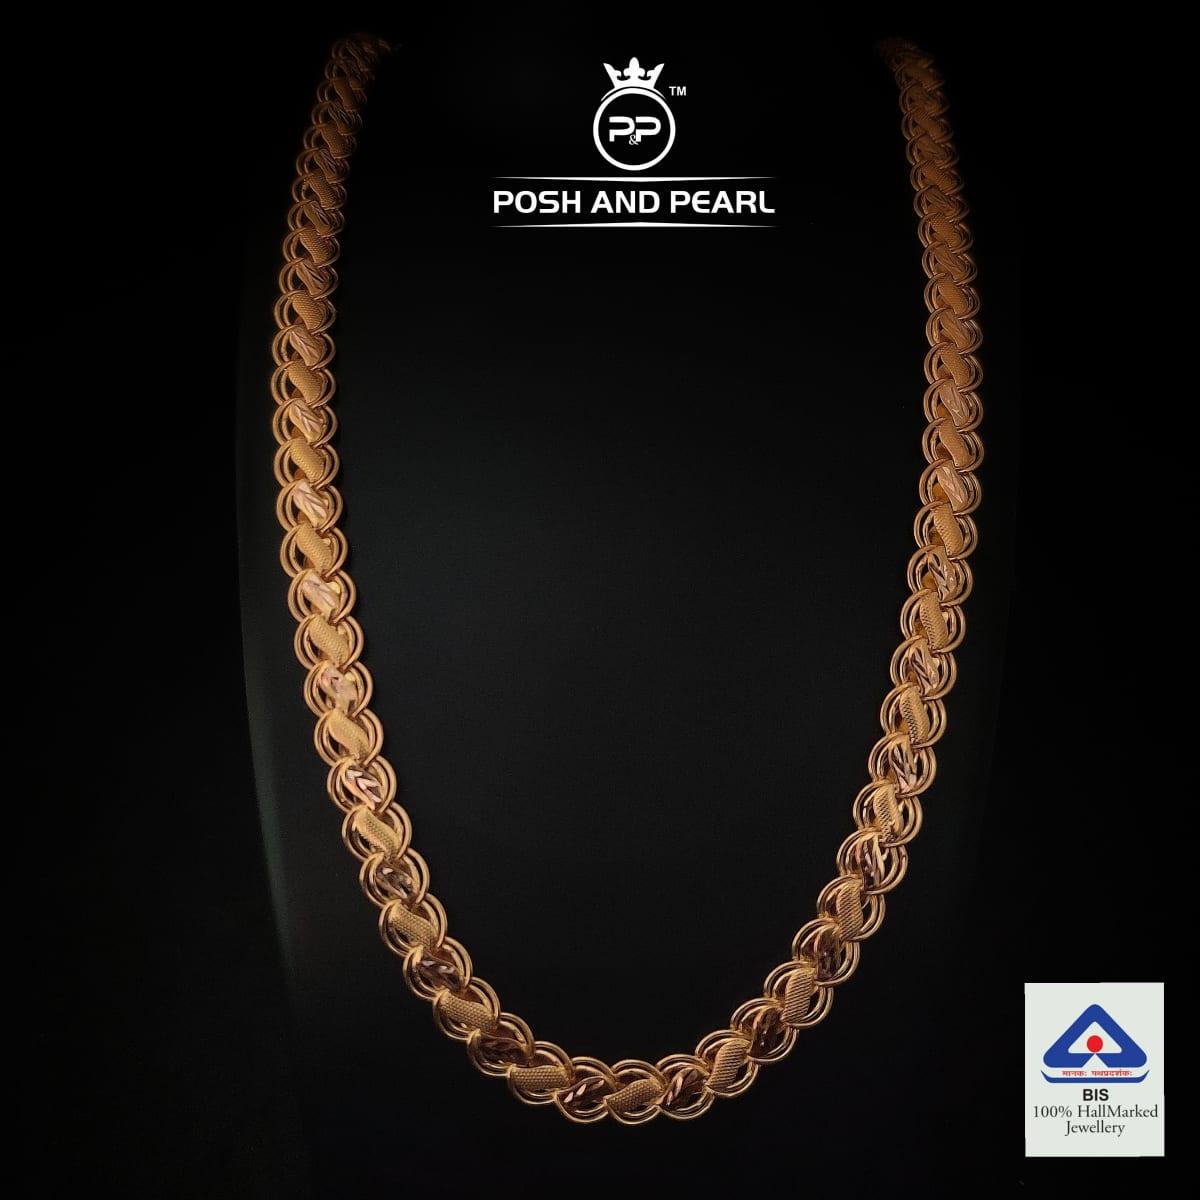 Lotus Chain